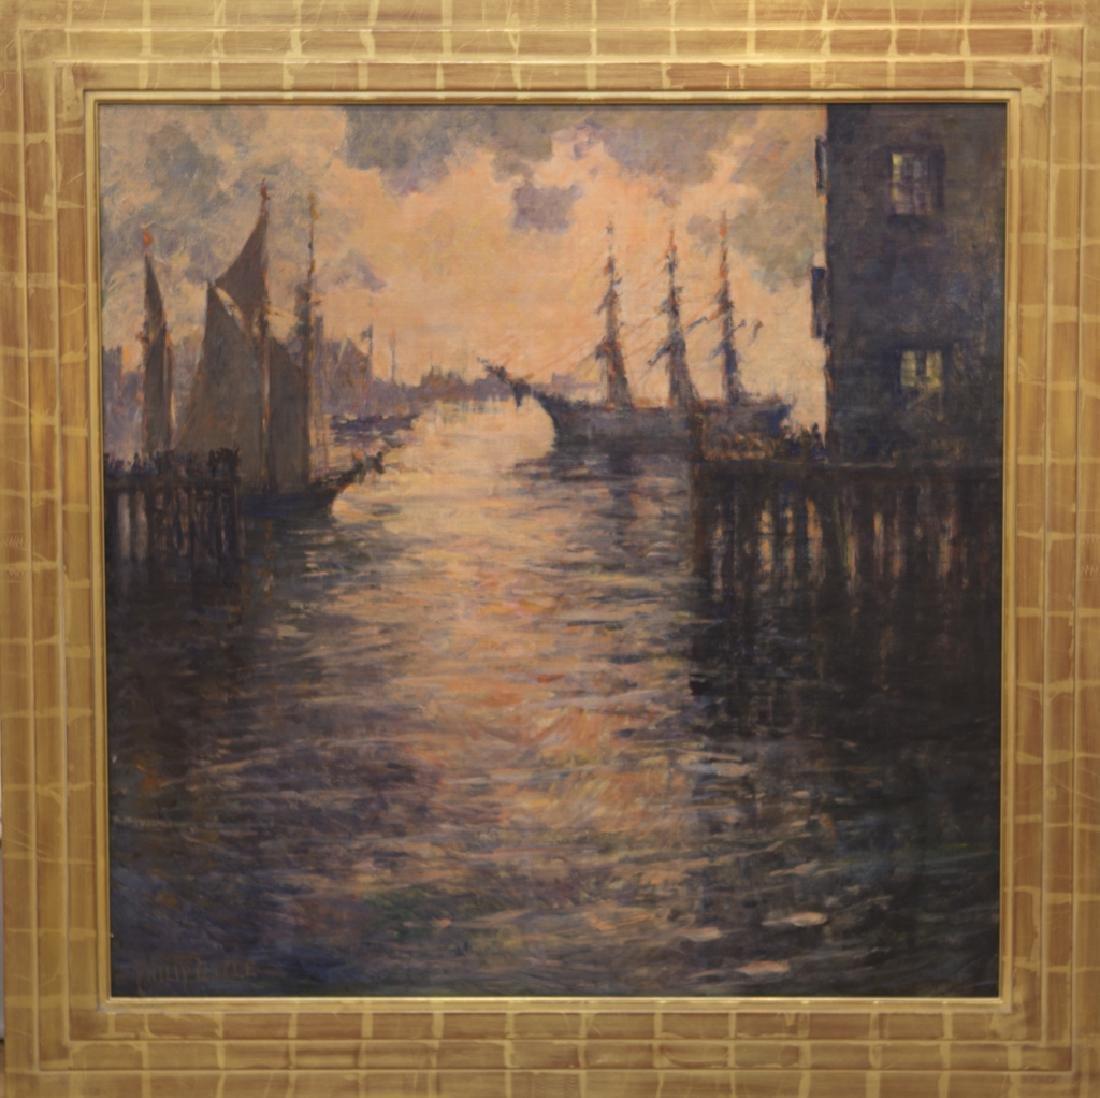 Philip  Little  1857-1942  The Salt Ship Gloucester,